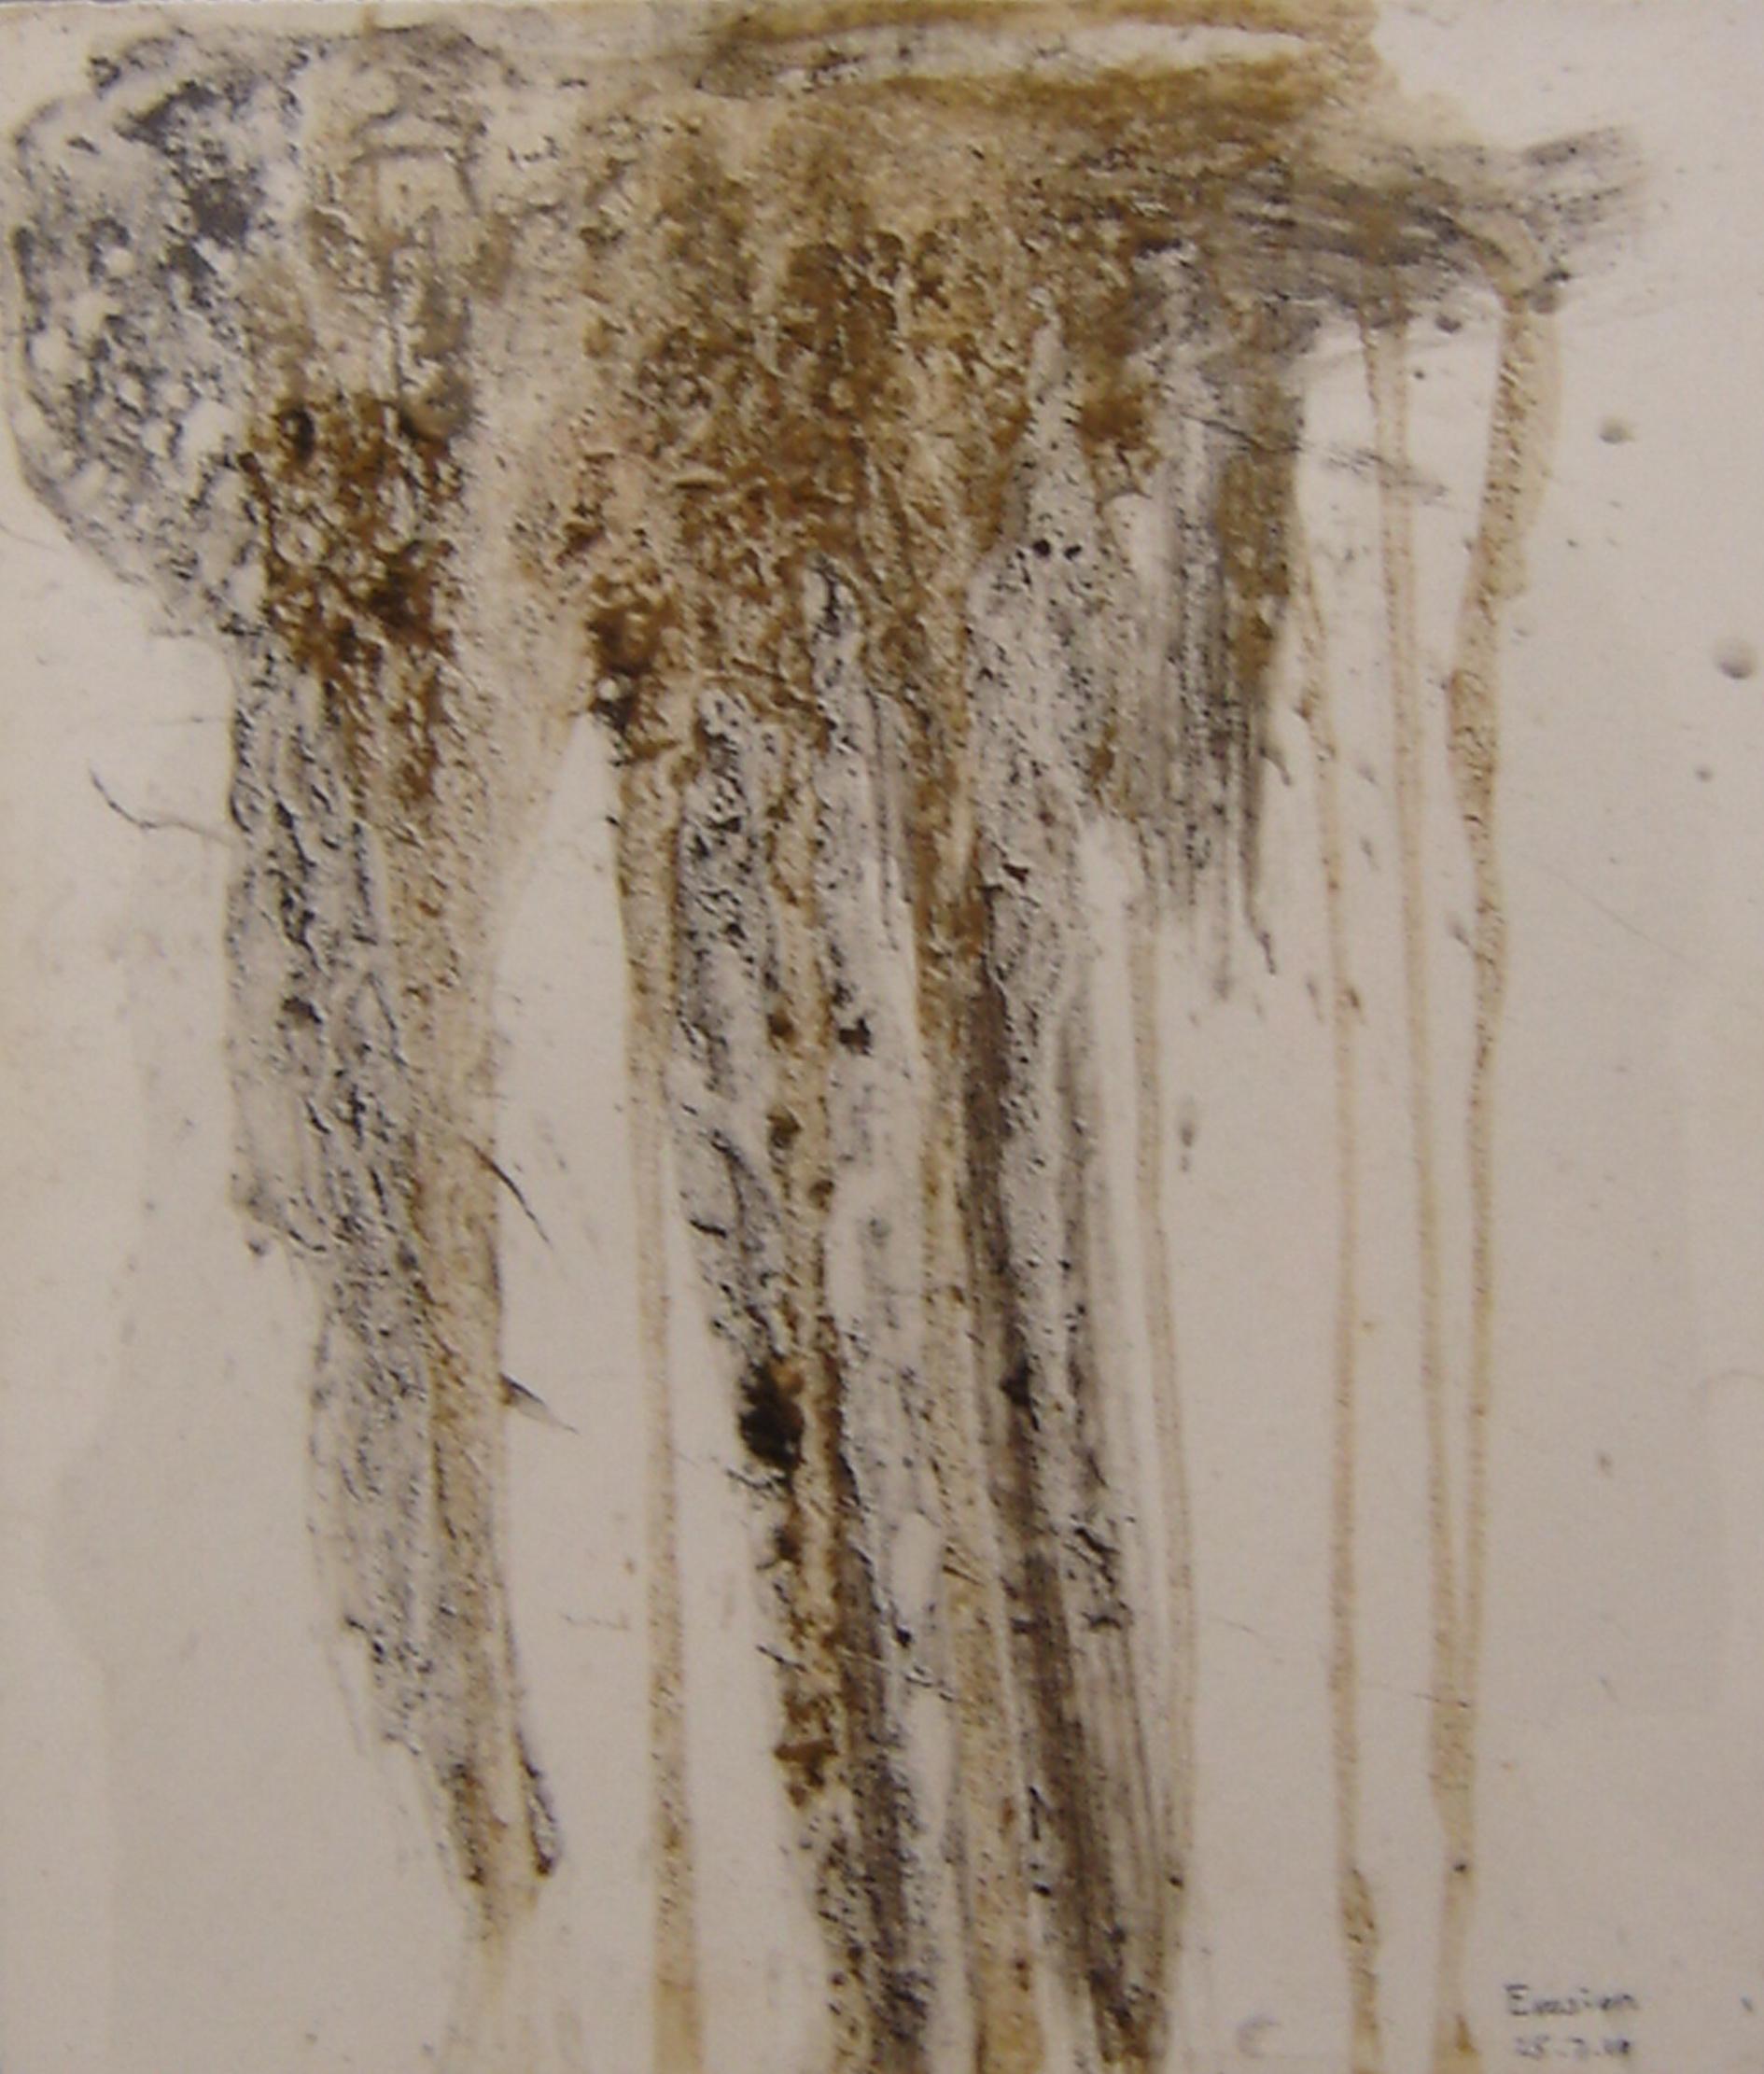 Erosion 1 Mud on gessoed paper 41 x 35 cm 2009